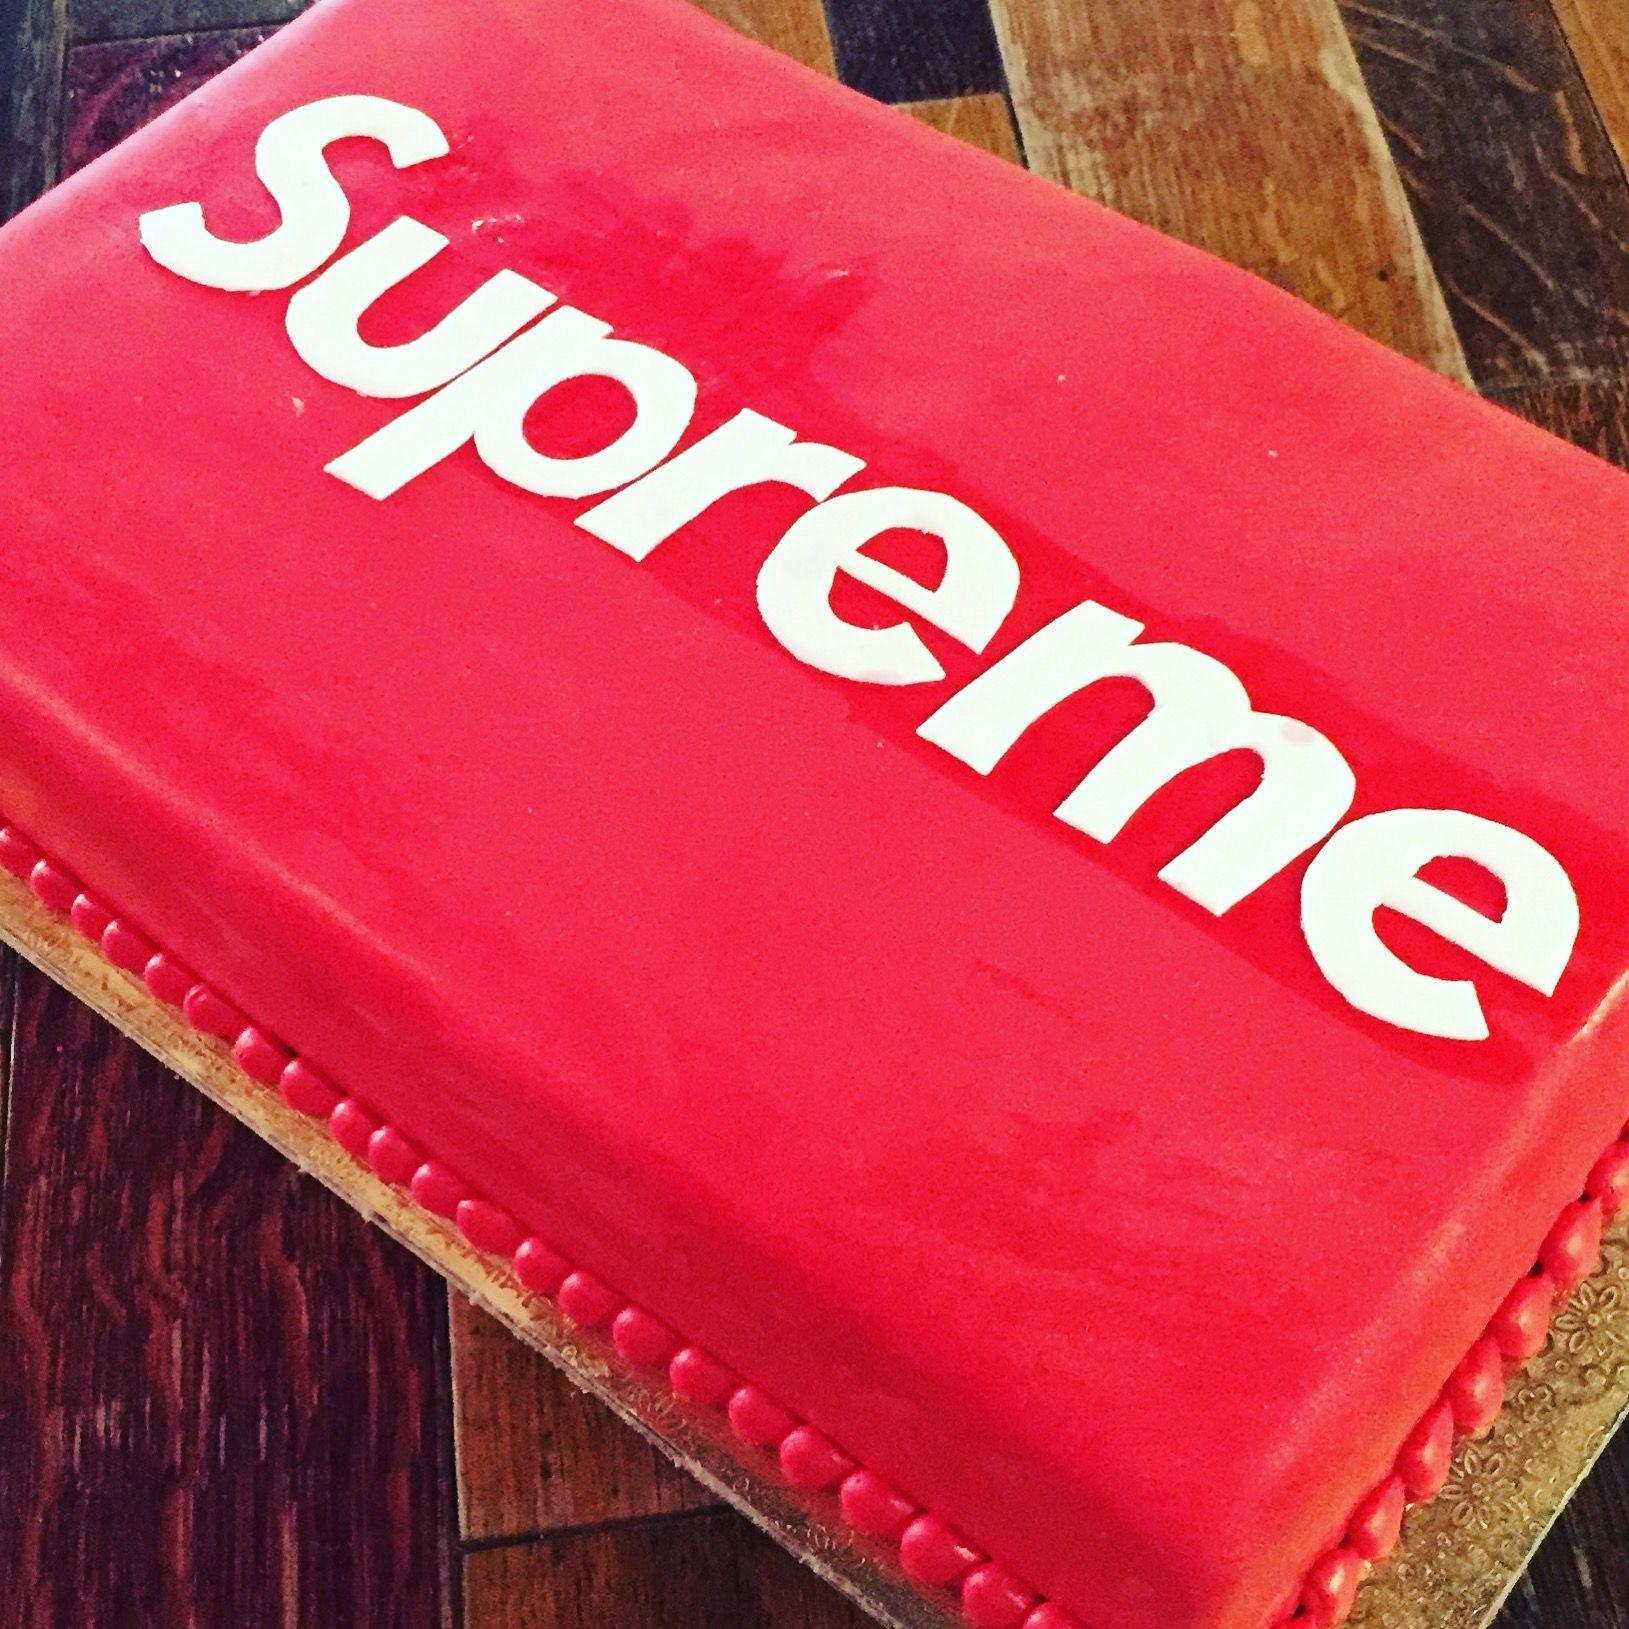 Supreme Brand Birthday Cake